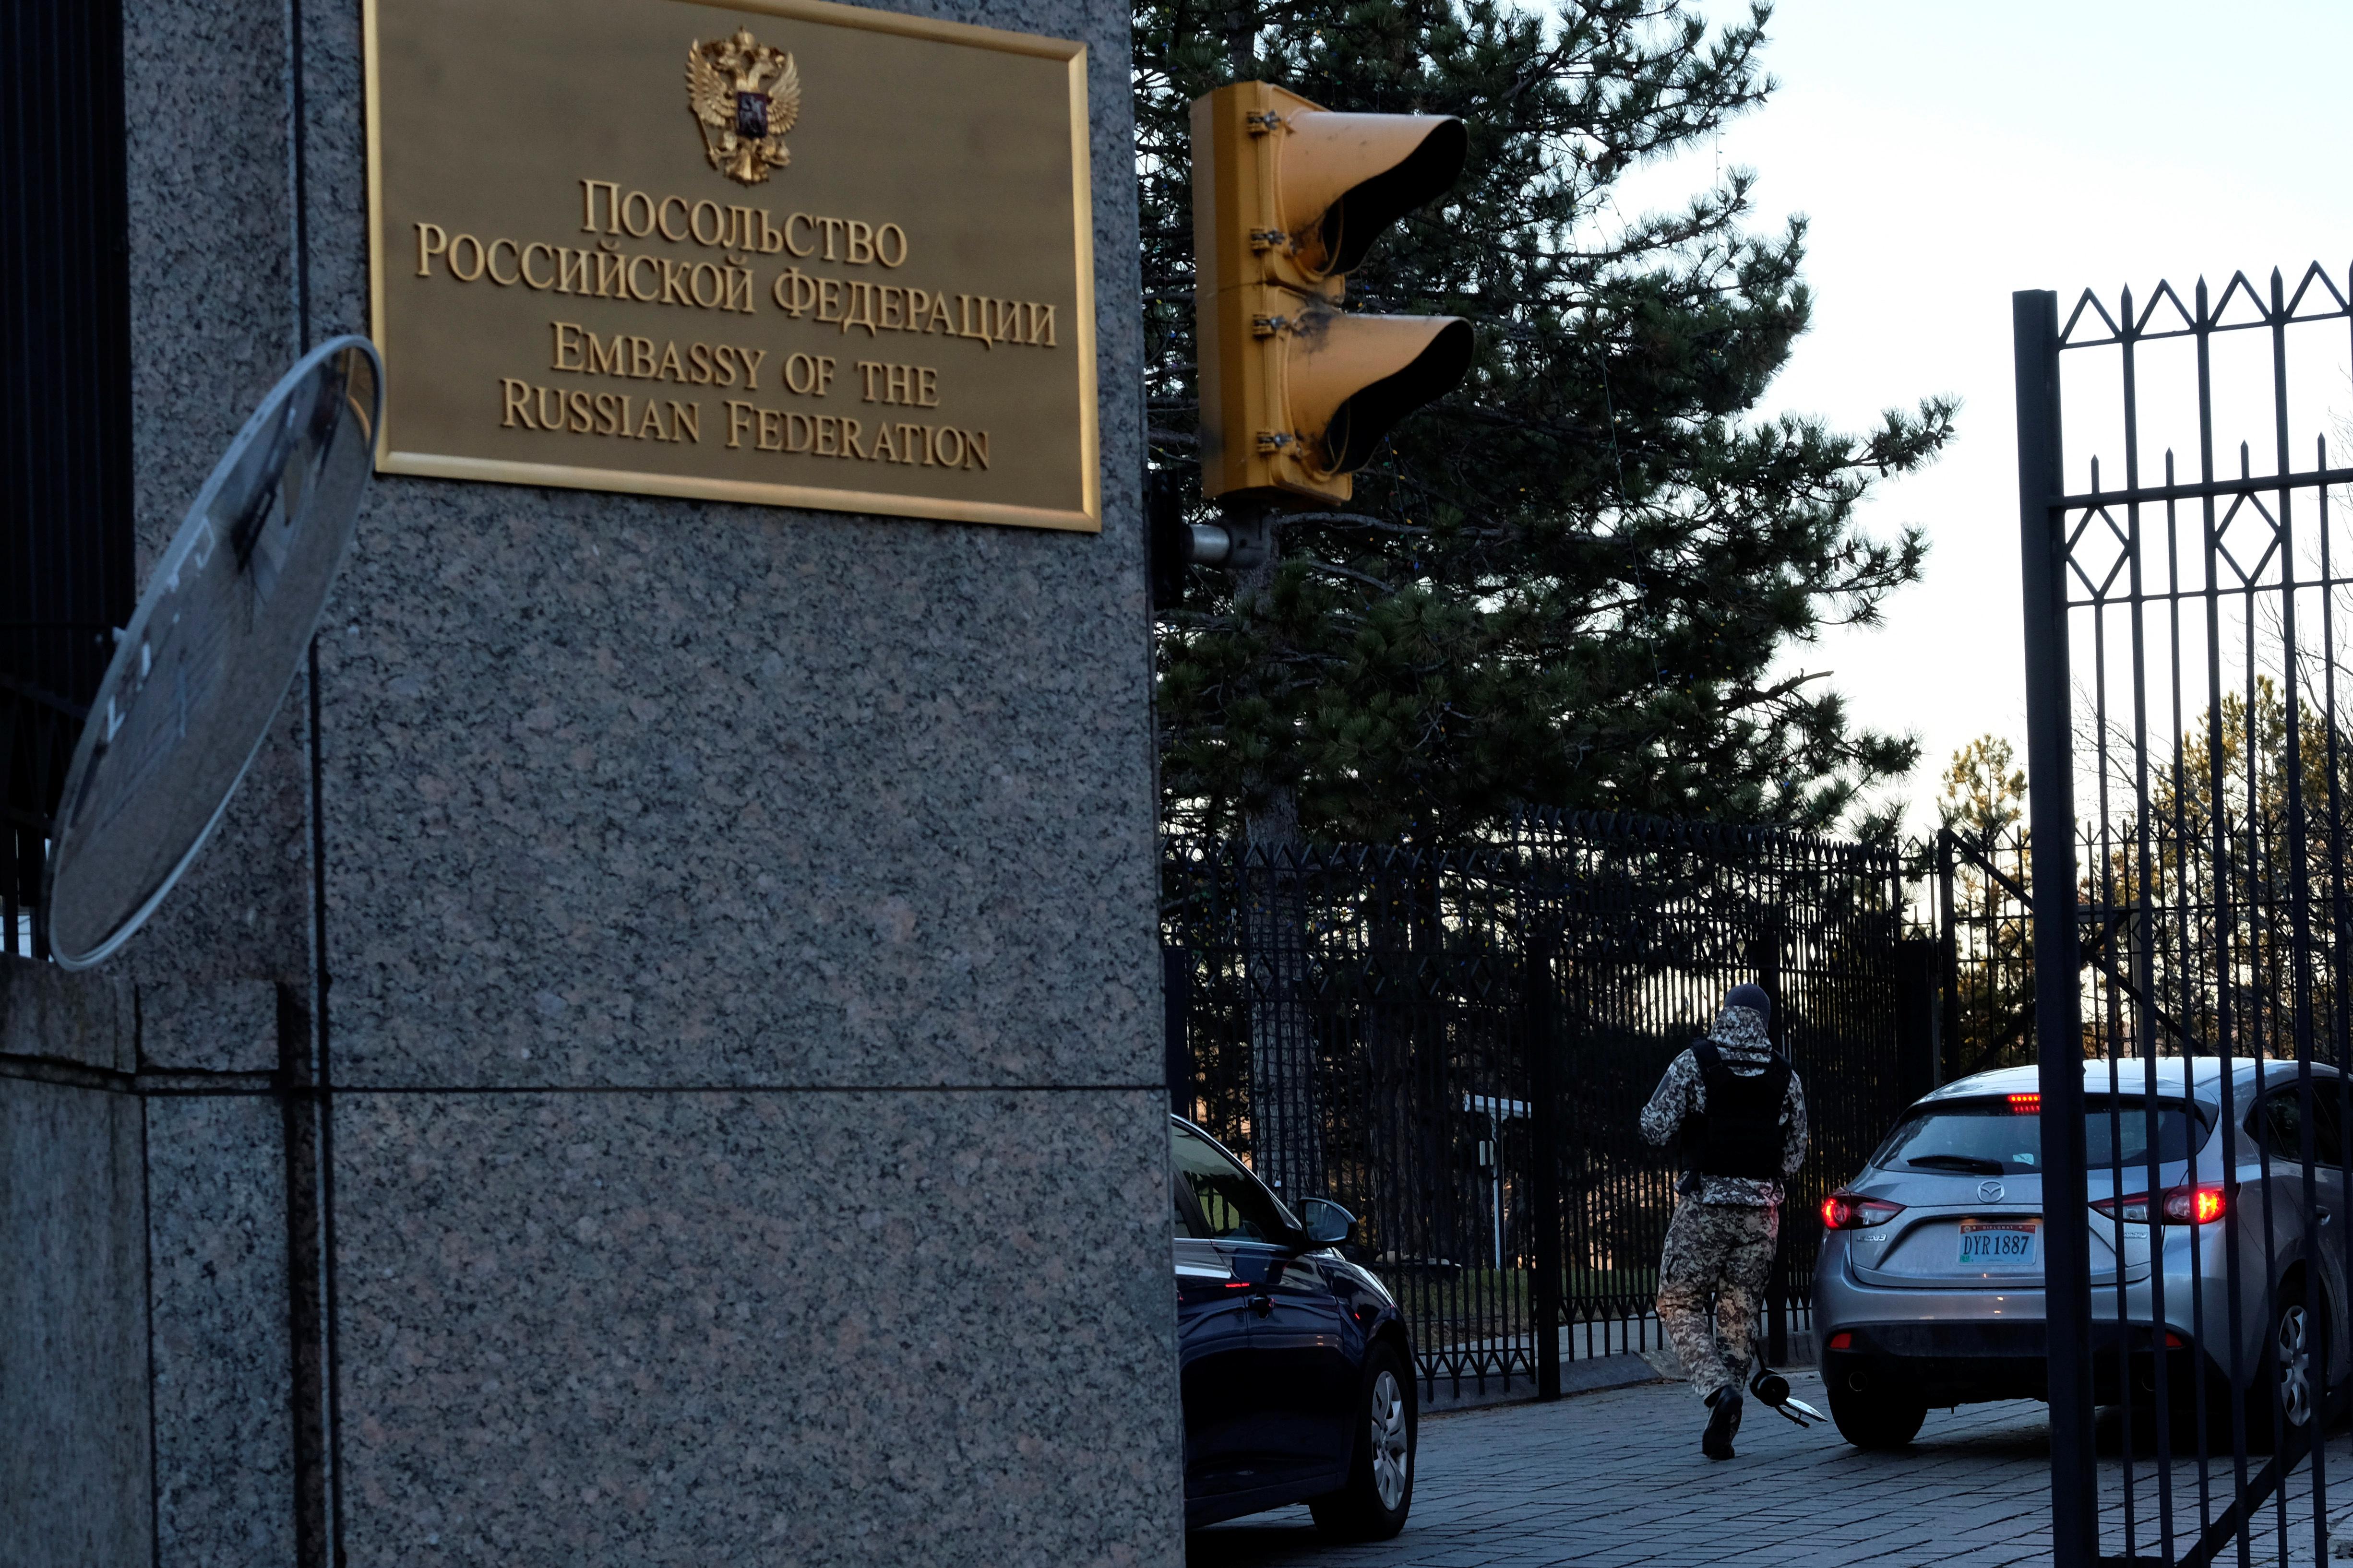 A guard screens cars entering the Russian embassy on Wisconsin Avenue in Washington, U.S. December 29, 2016. REUTERS/James Lawler Duggan